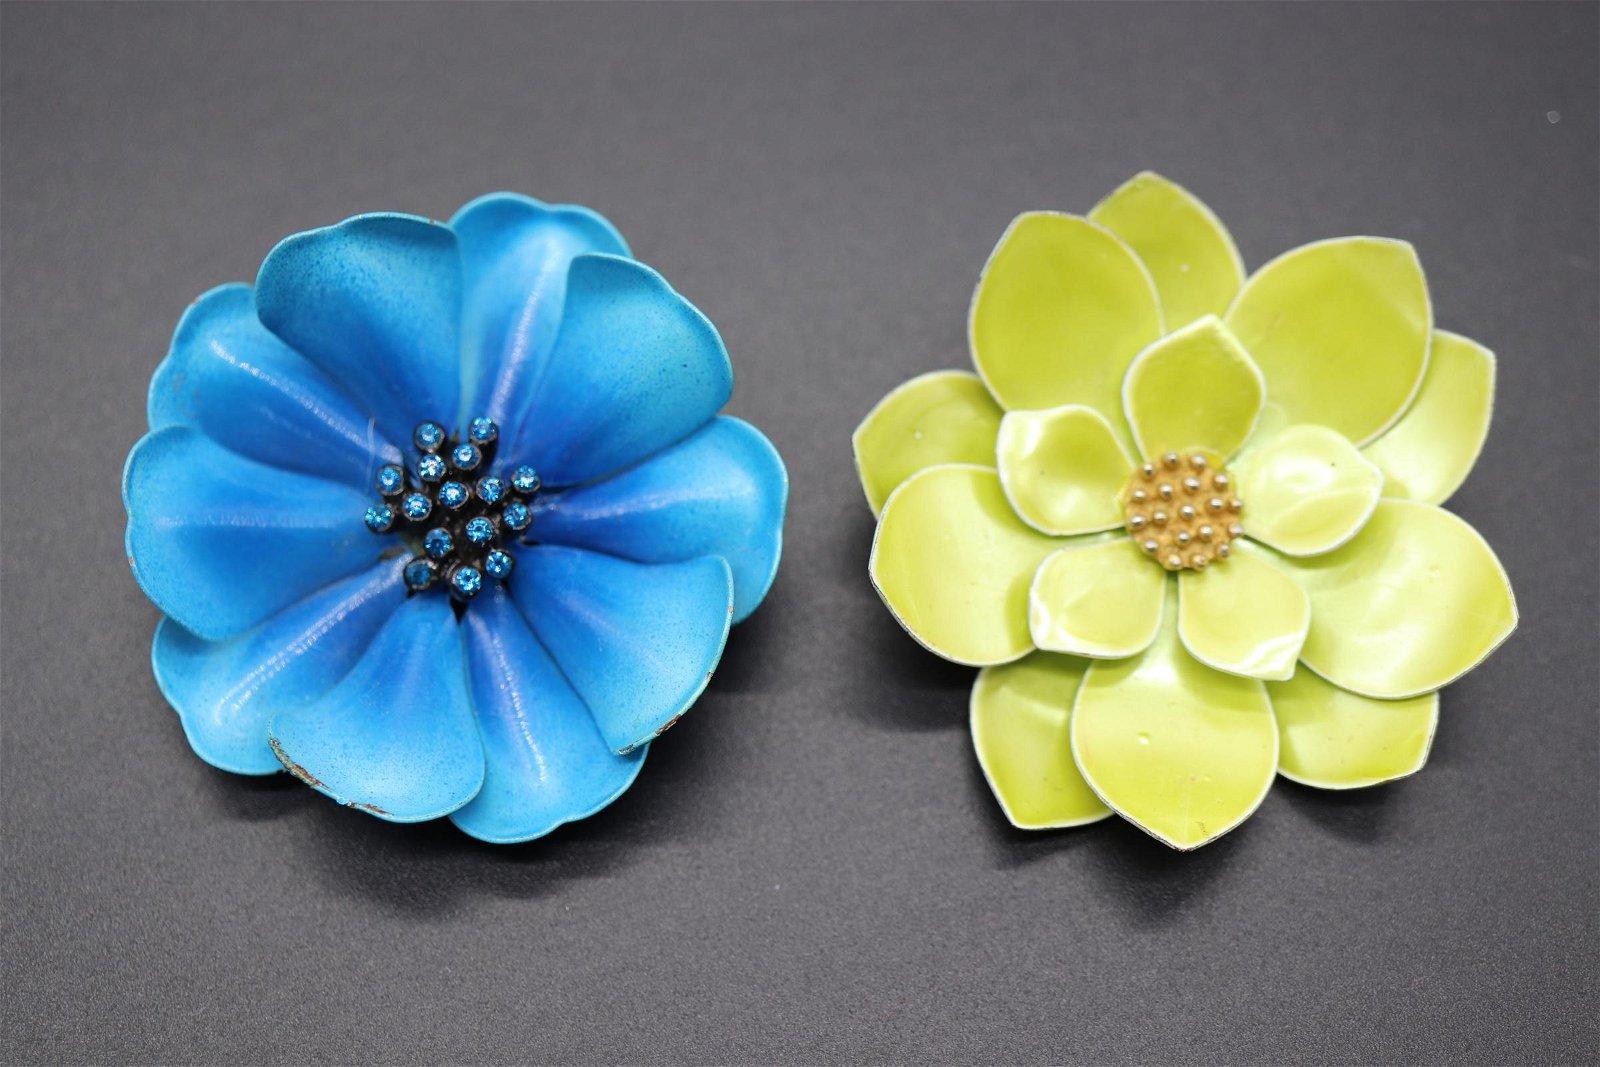 Lot of 2 Vintage 3-D Enamel Flower Brooches